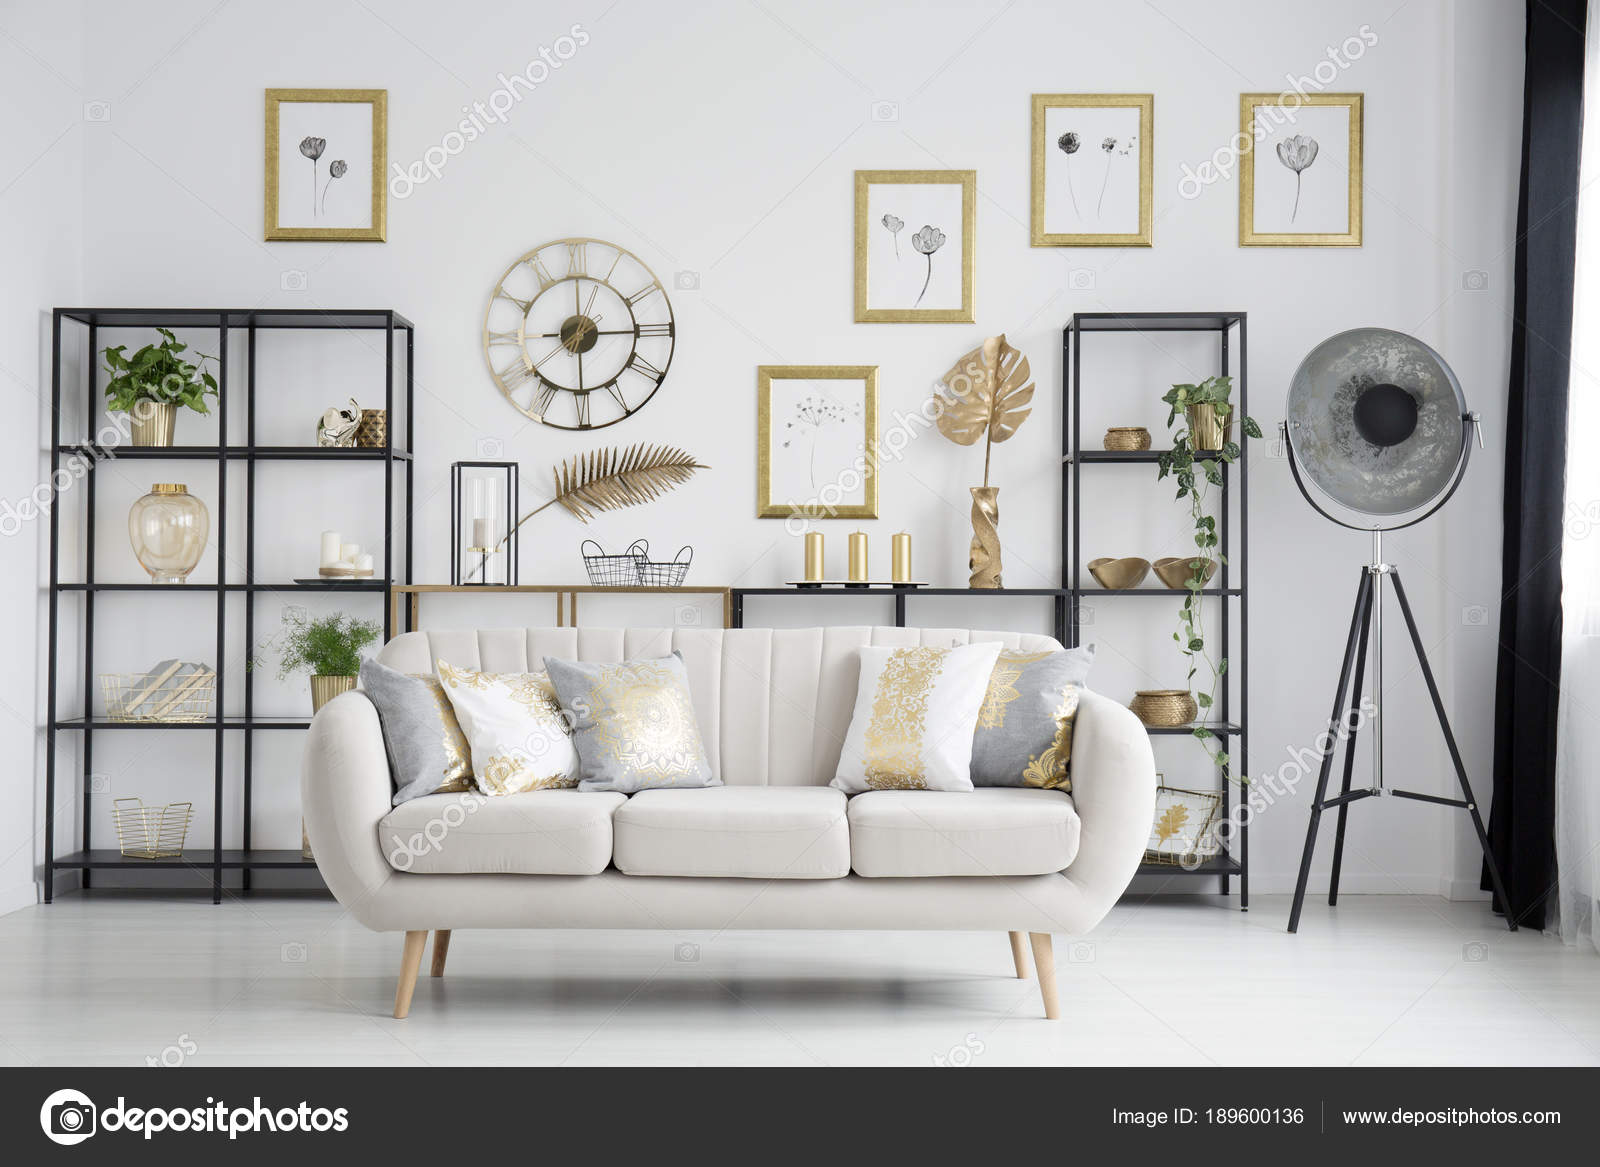 Sofa im Wohnzimmer gold — Stockfoto © photographee.eu #189600136